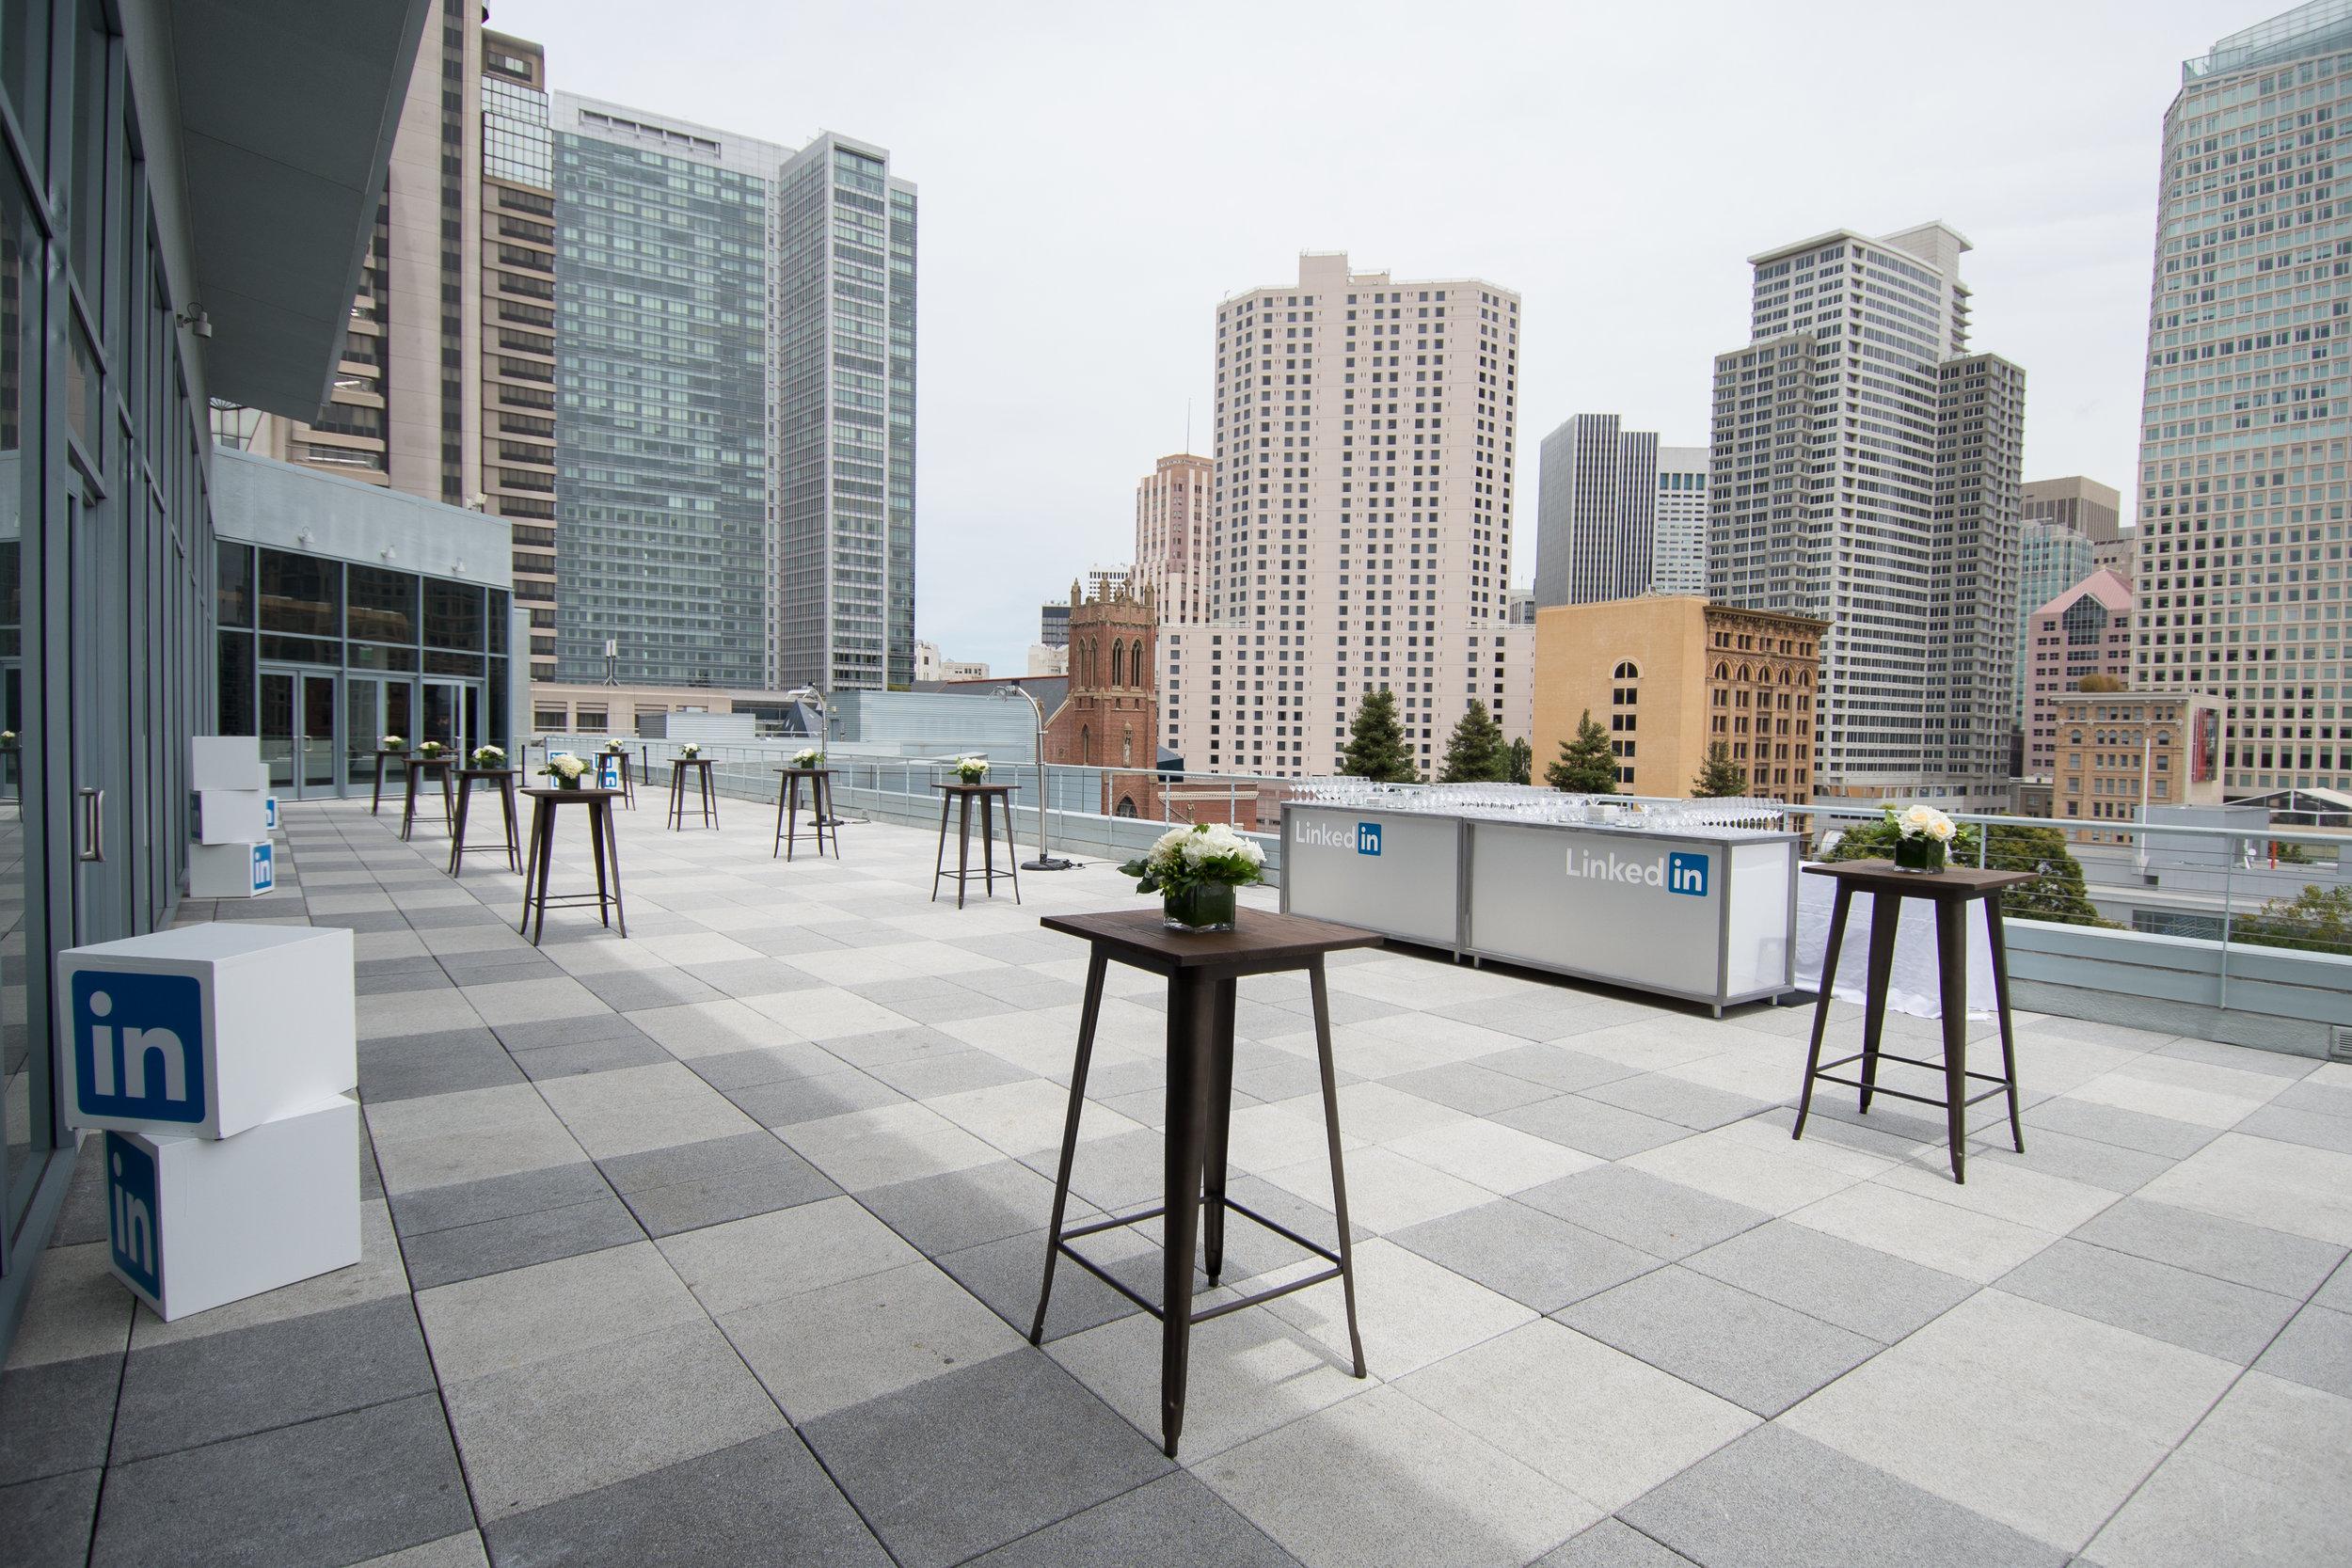 LinkedIn B2B Connect Tour San Fransisco Outdoor Terrace